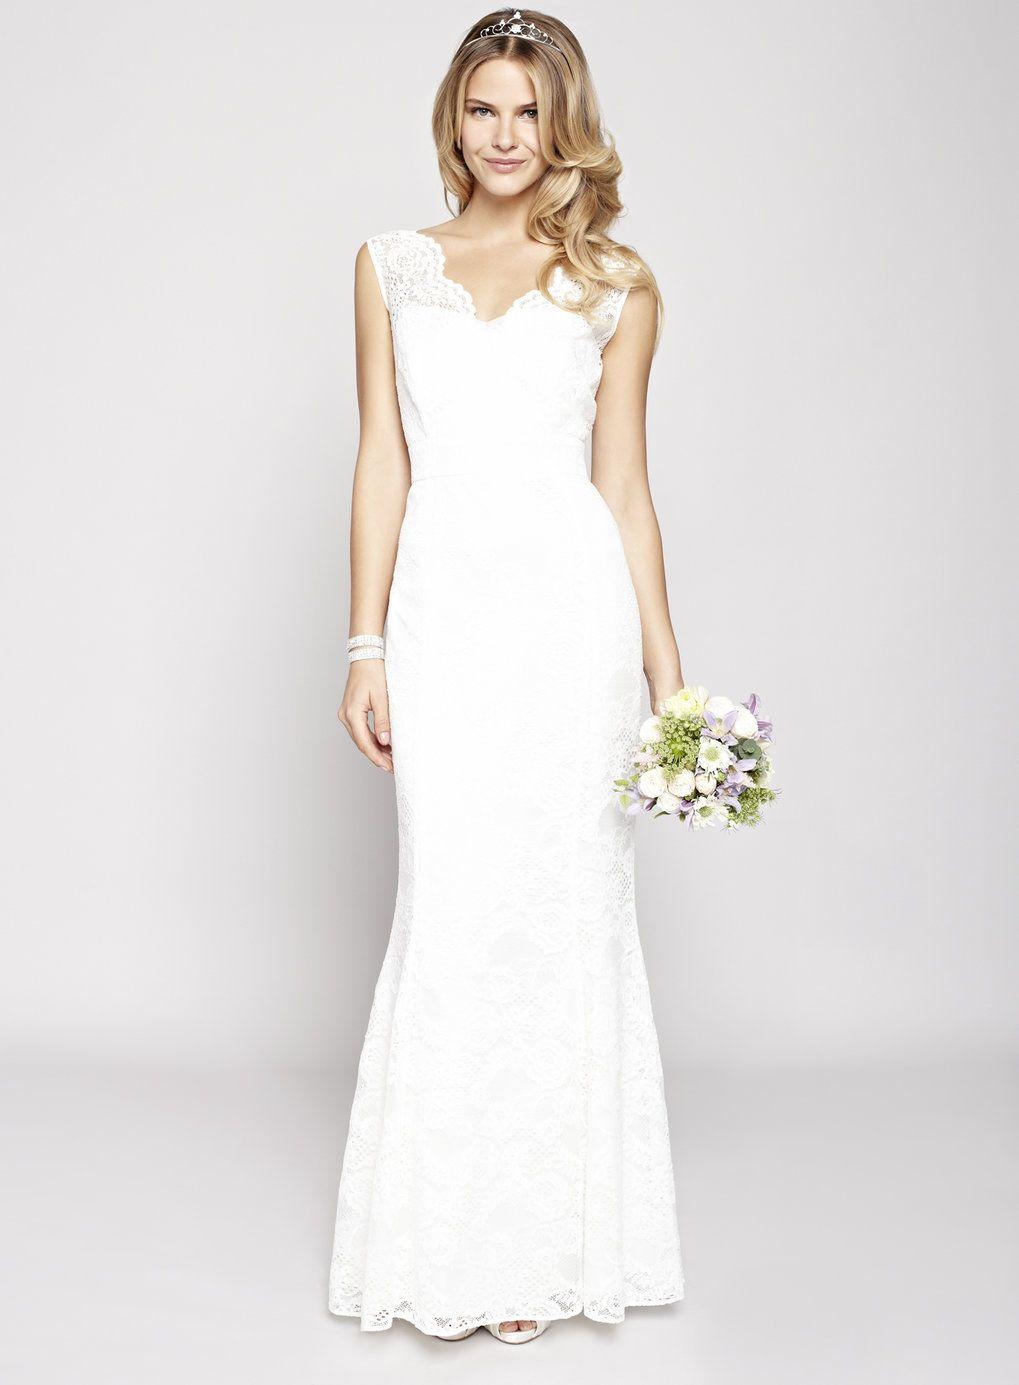 Ivory Florence Wedding Dress Bhs High Street Wedding Dresses Wedding Dresses Wedding Dress Over 40